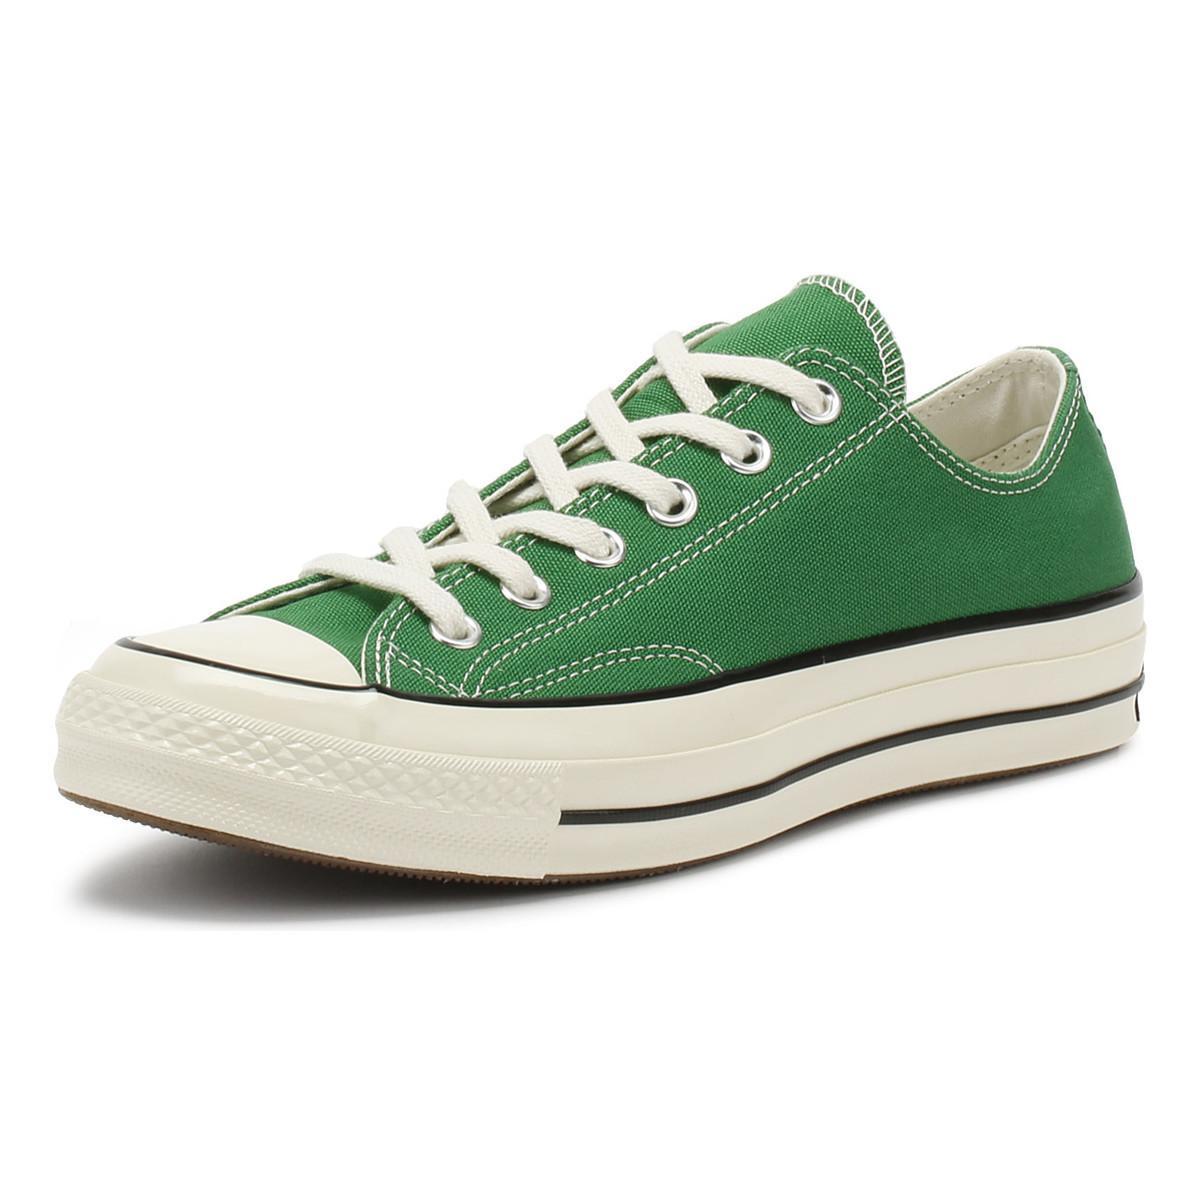 22f93e58e71506 Converse Chuck Taylor All Star Green Chuck 70 Ox Trainers Wo cheap 87928  7a3c5 ...